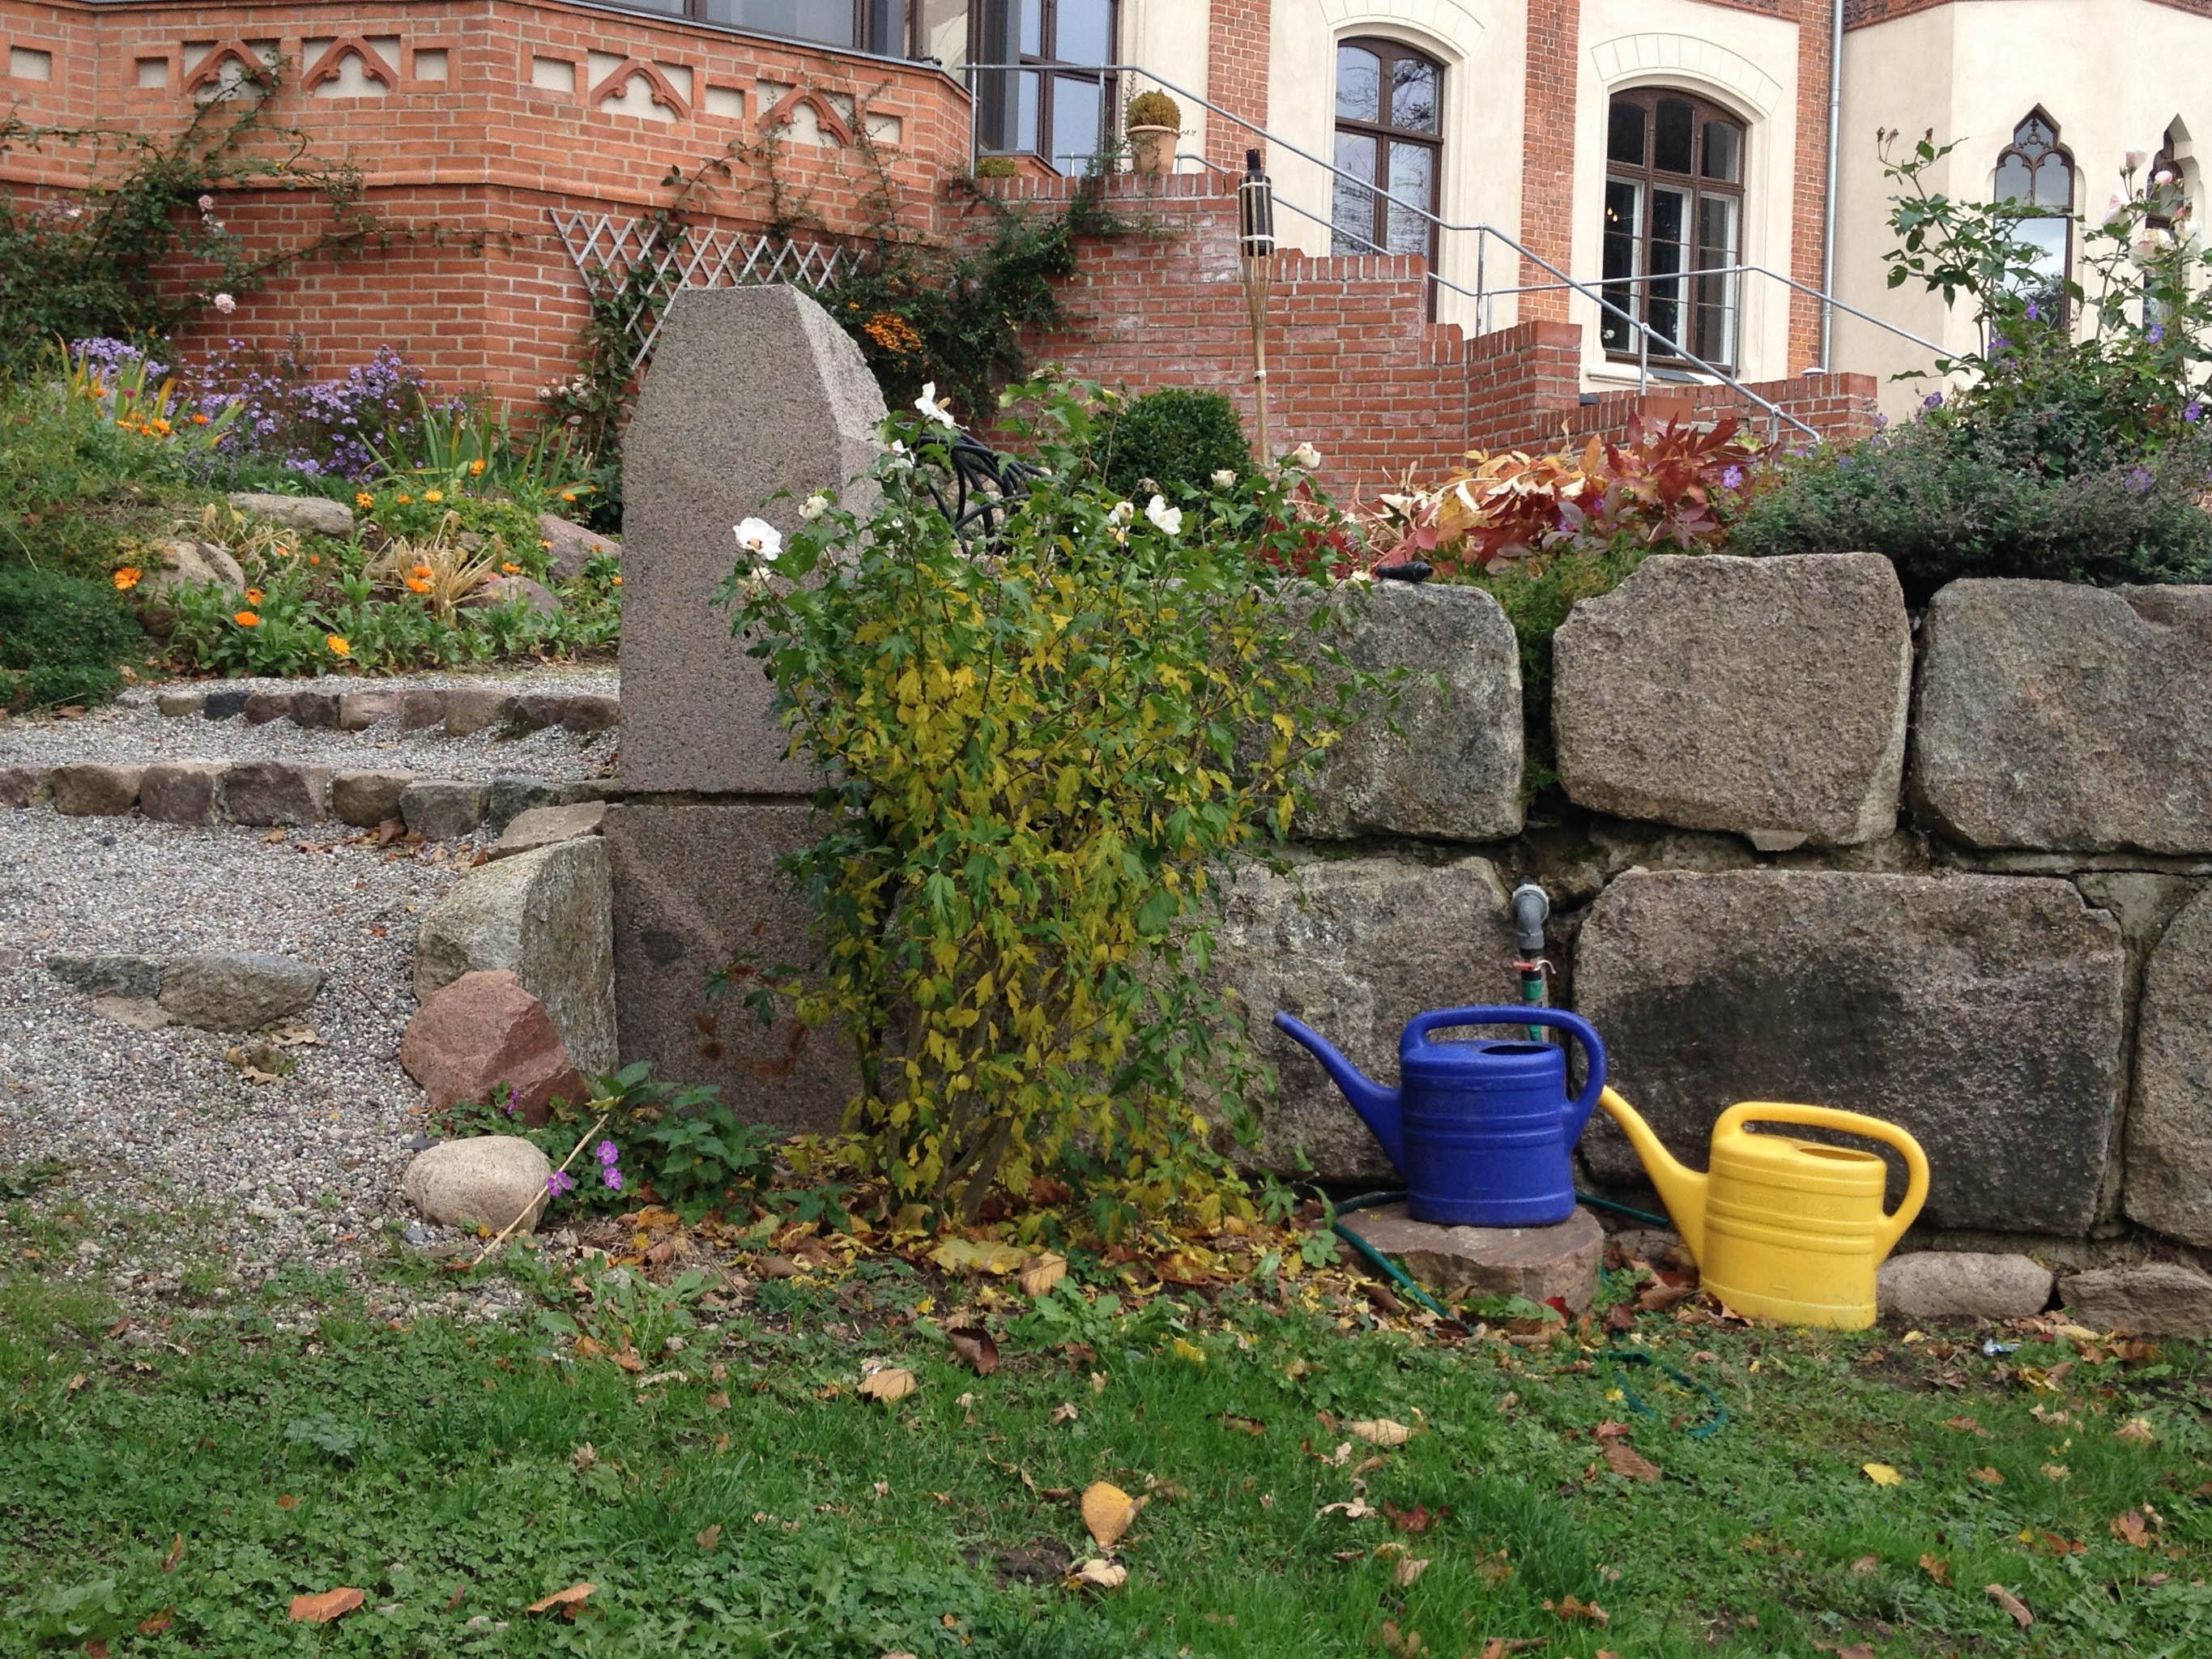 Stenen Muur Tuin : Gratis afbeeldingen gras gazon bloem achtererf stenen muur